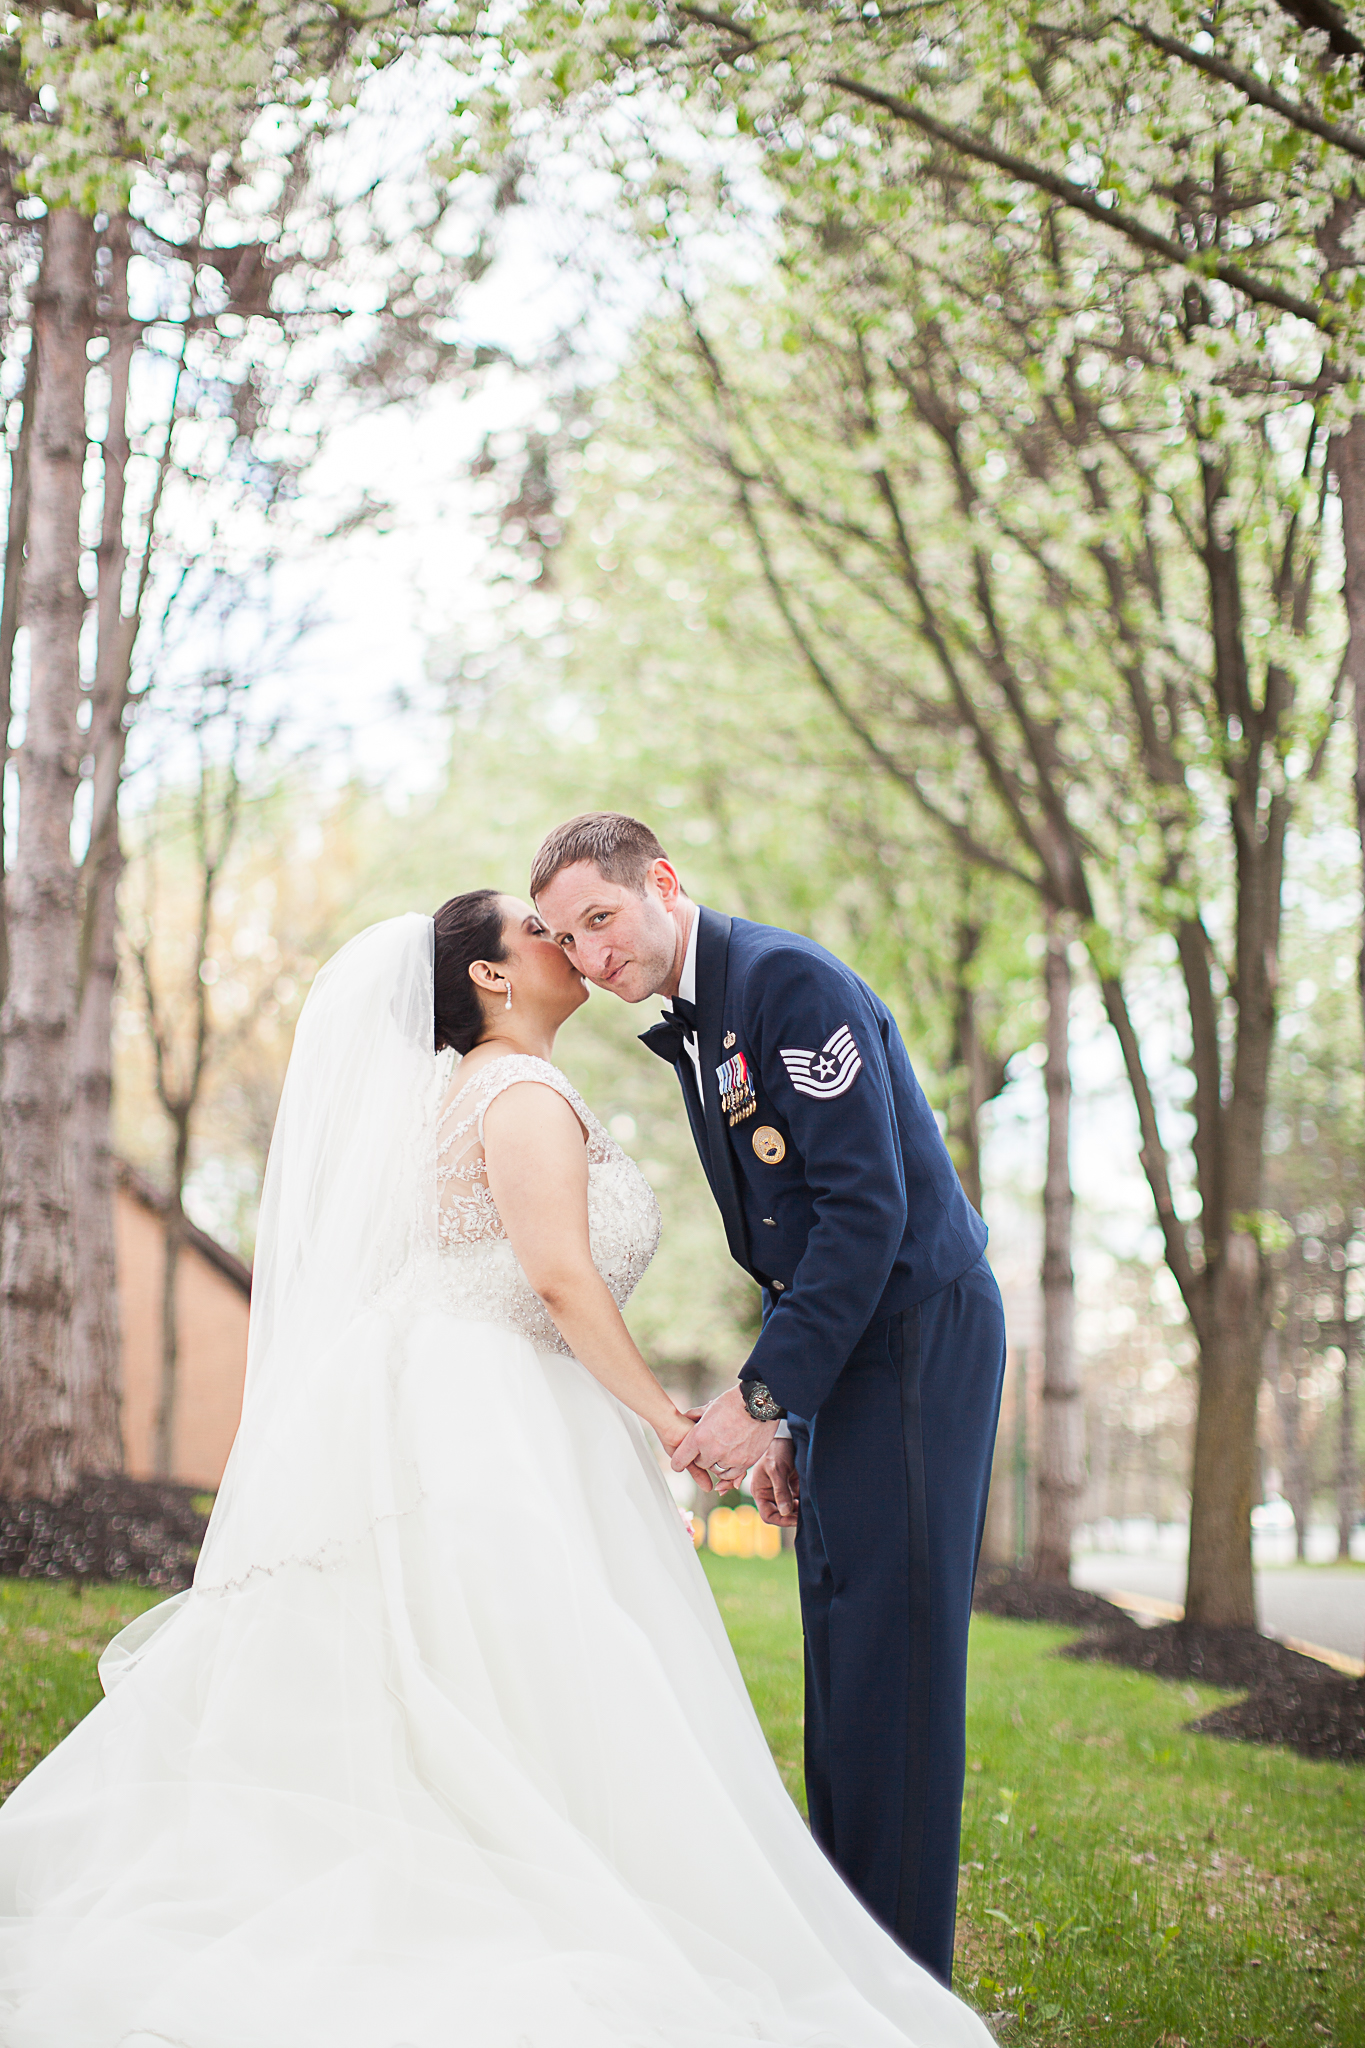 Jacci-Alan-Wedding-Kim-Pham-Clark-Photography-10.jpg